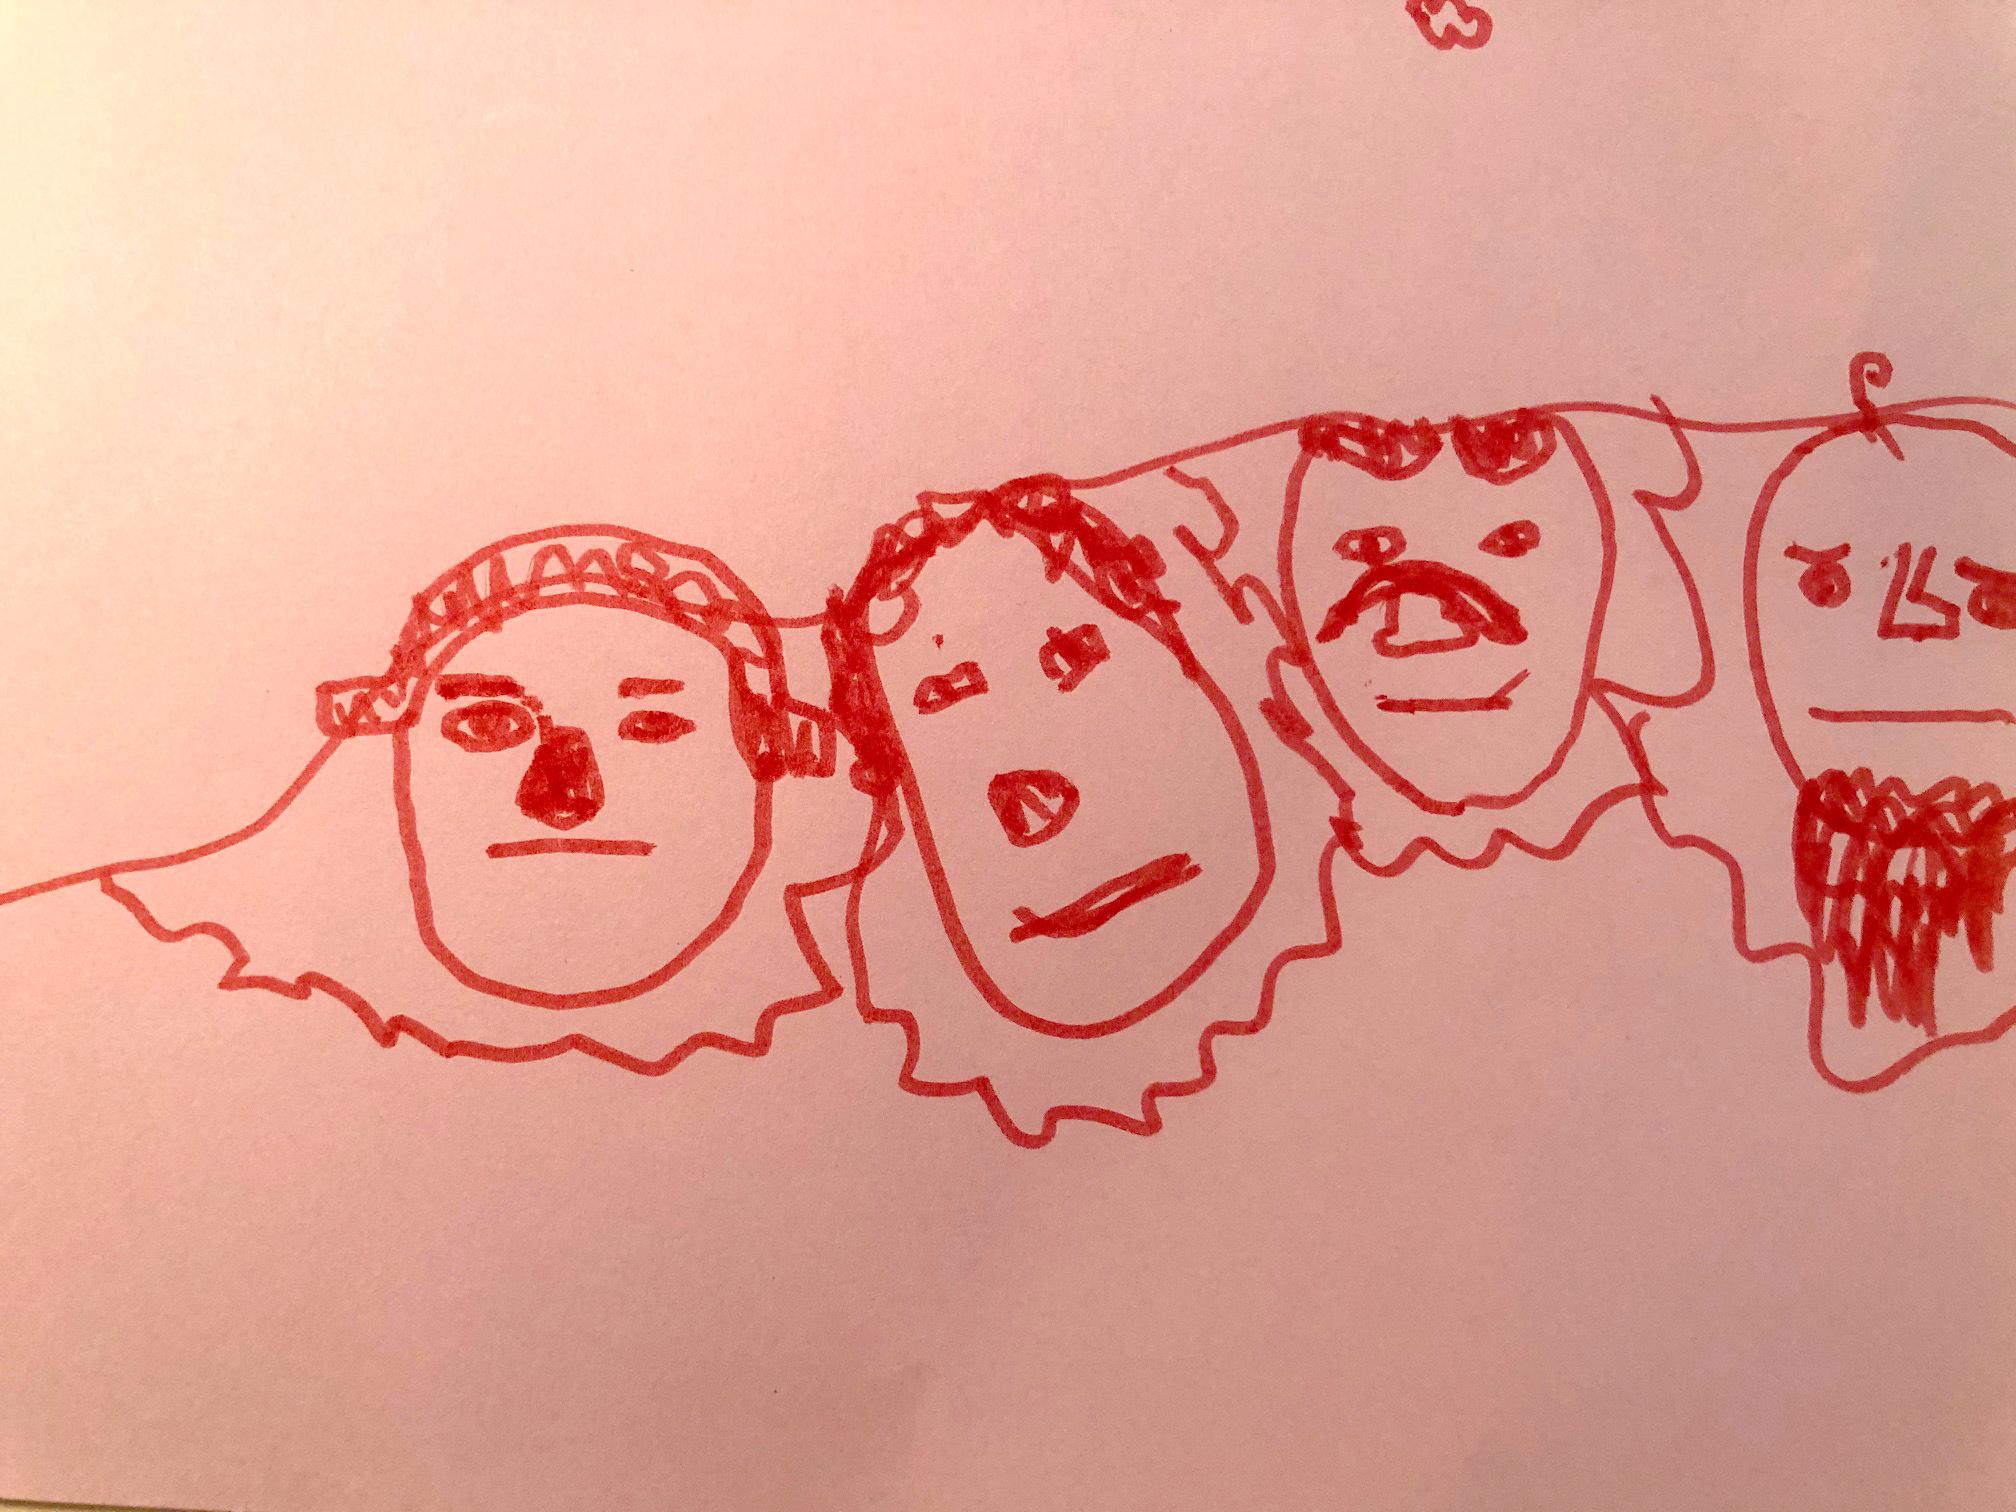 Kids Drawing Mt Rushmore